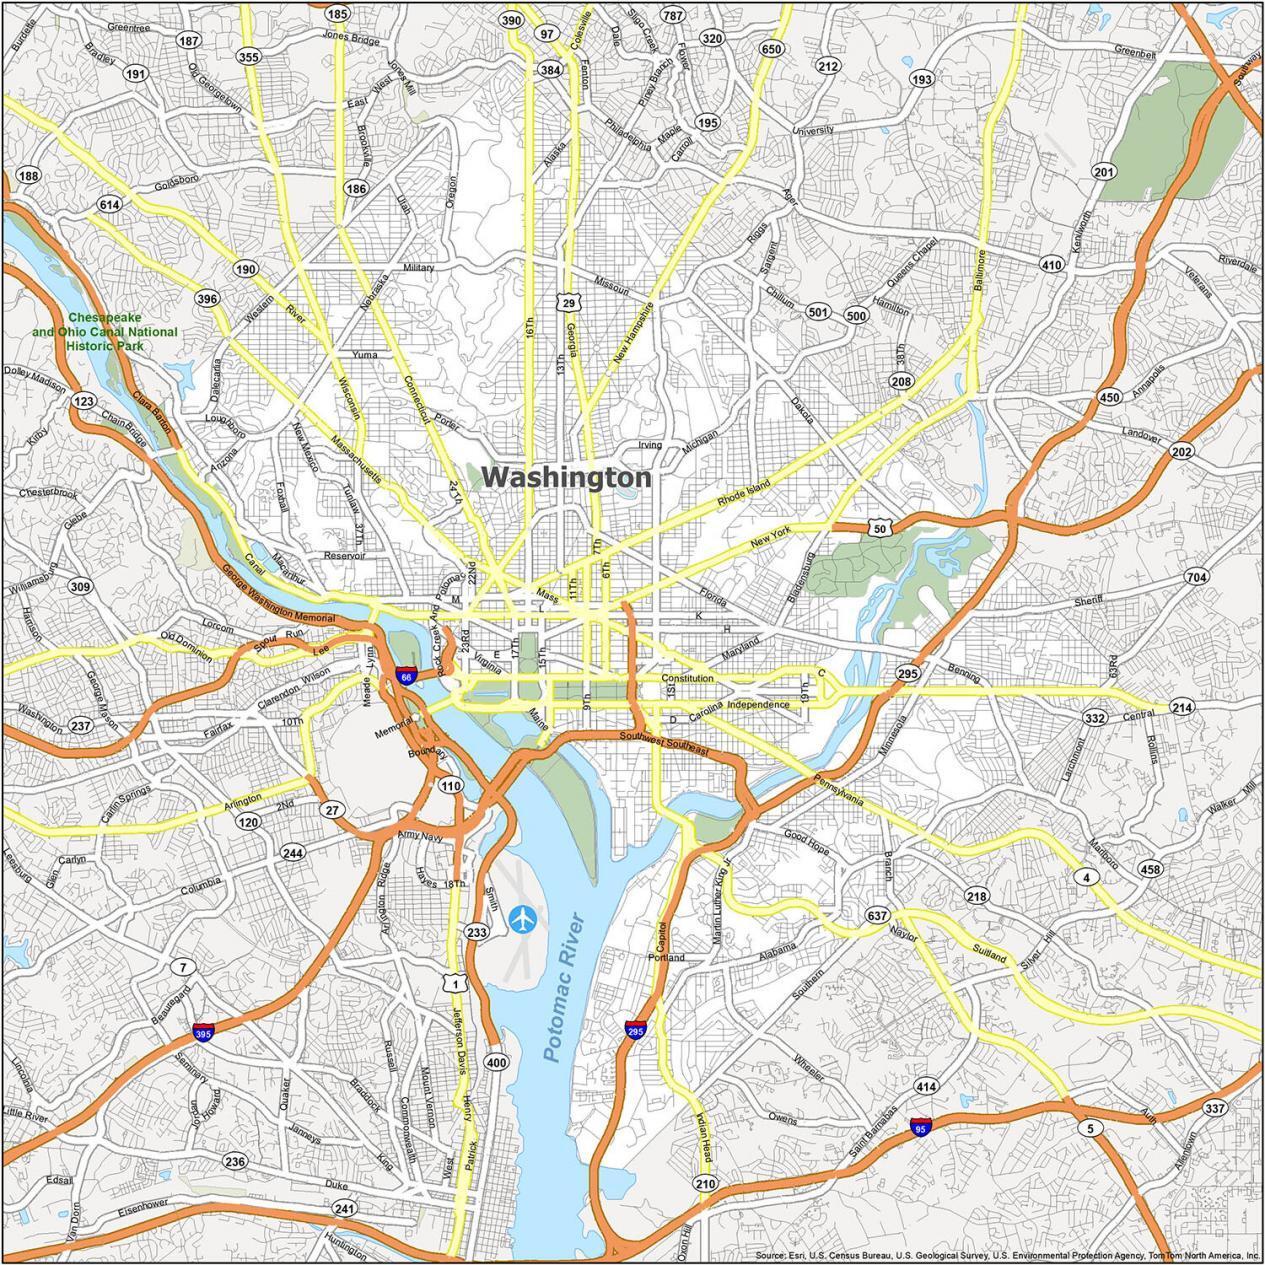 Washington DC Road Map